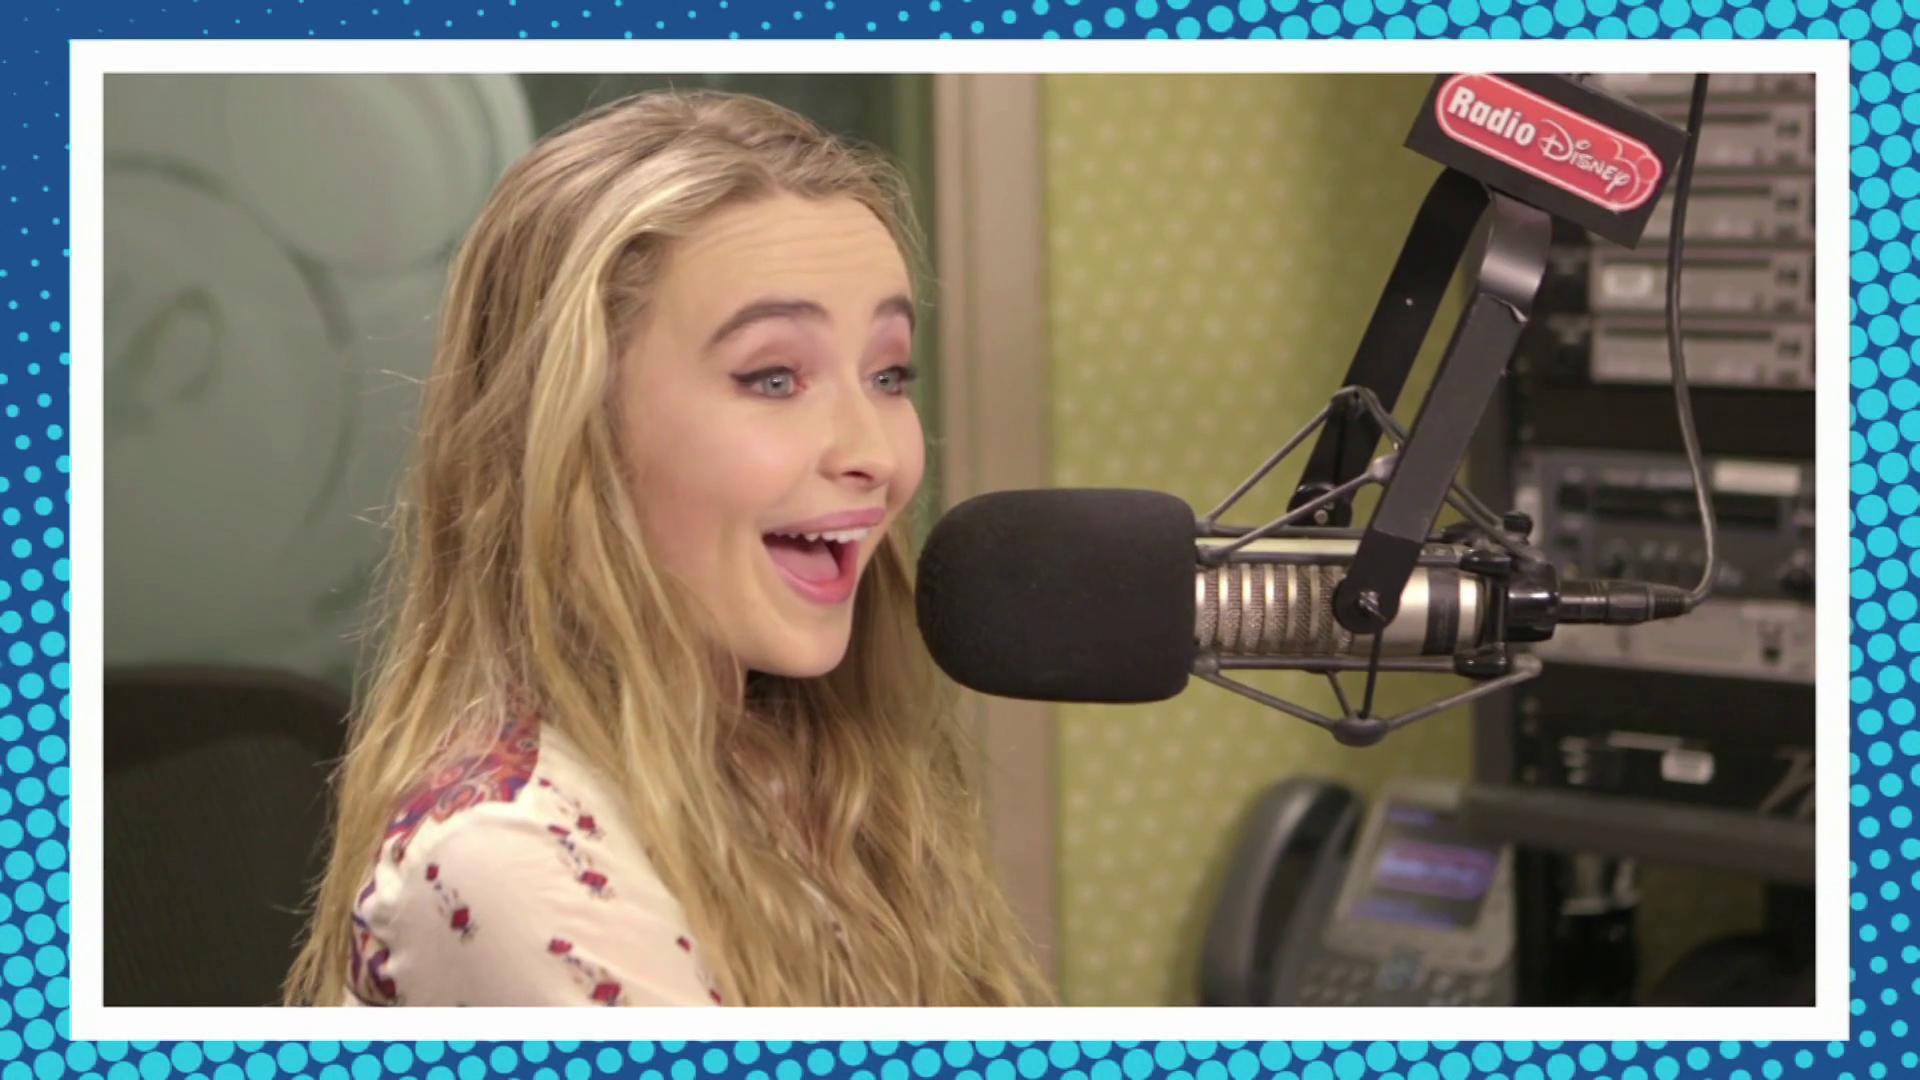 Sabrina Carpenter Take Over | Radio Disney